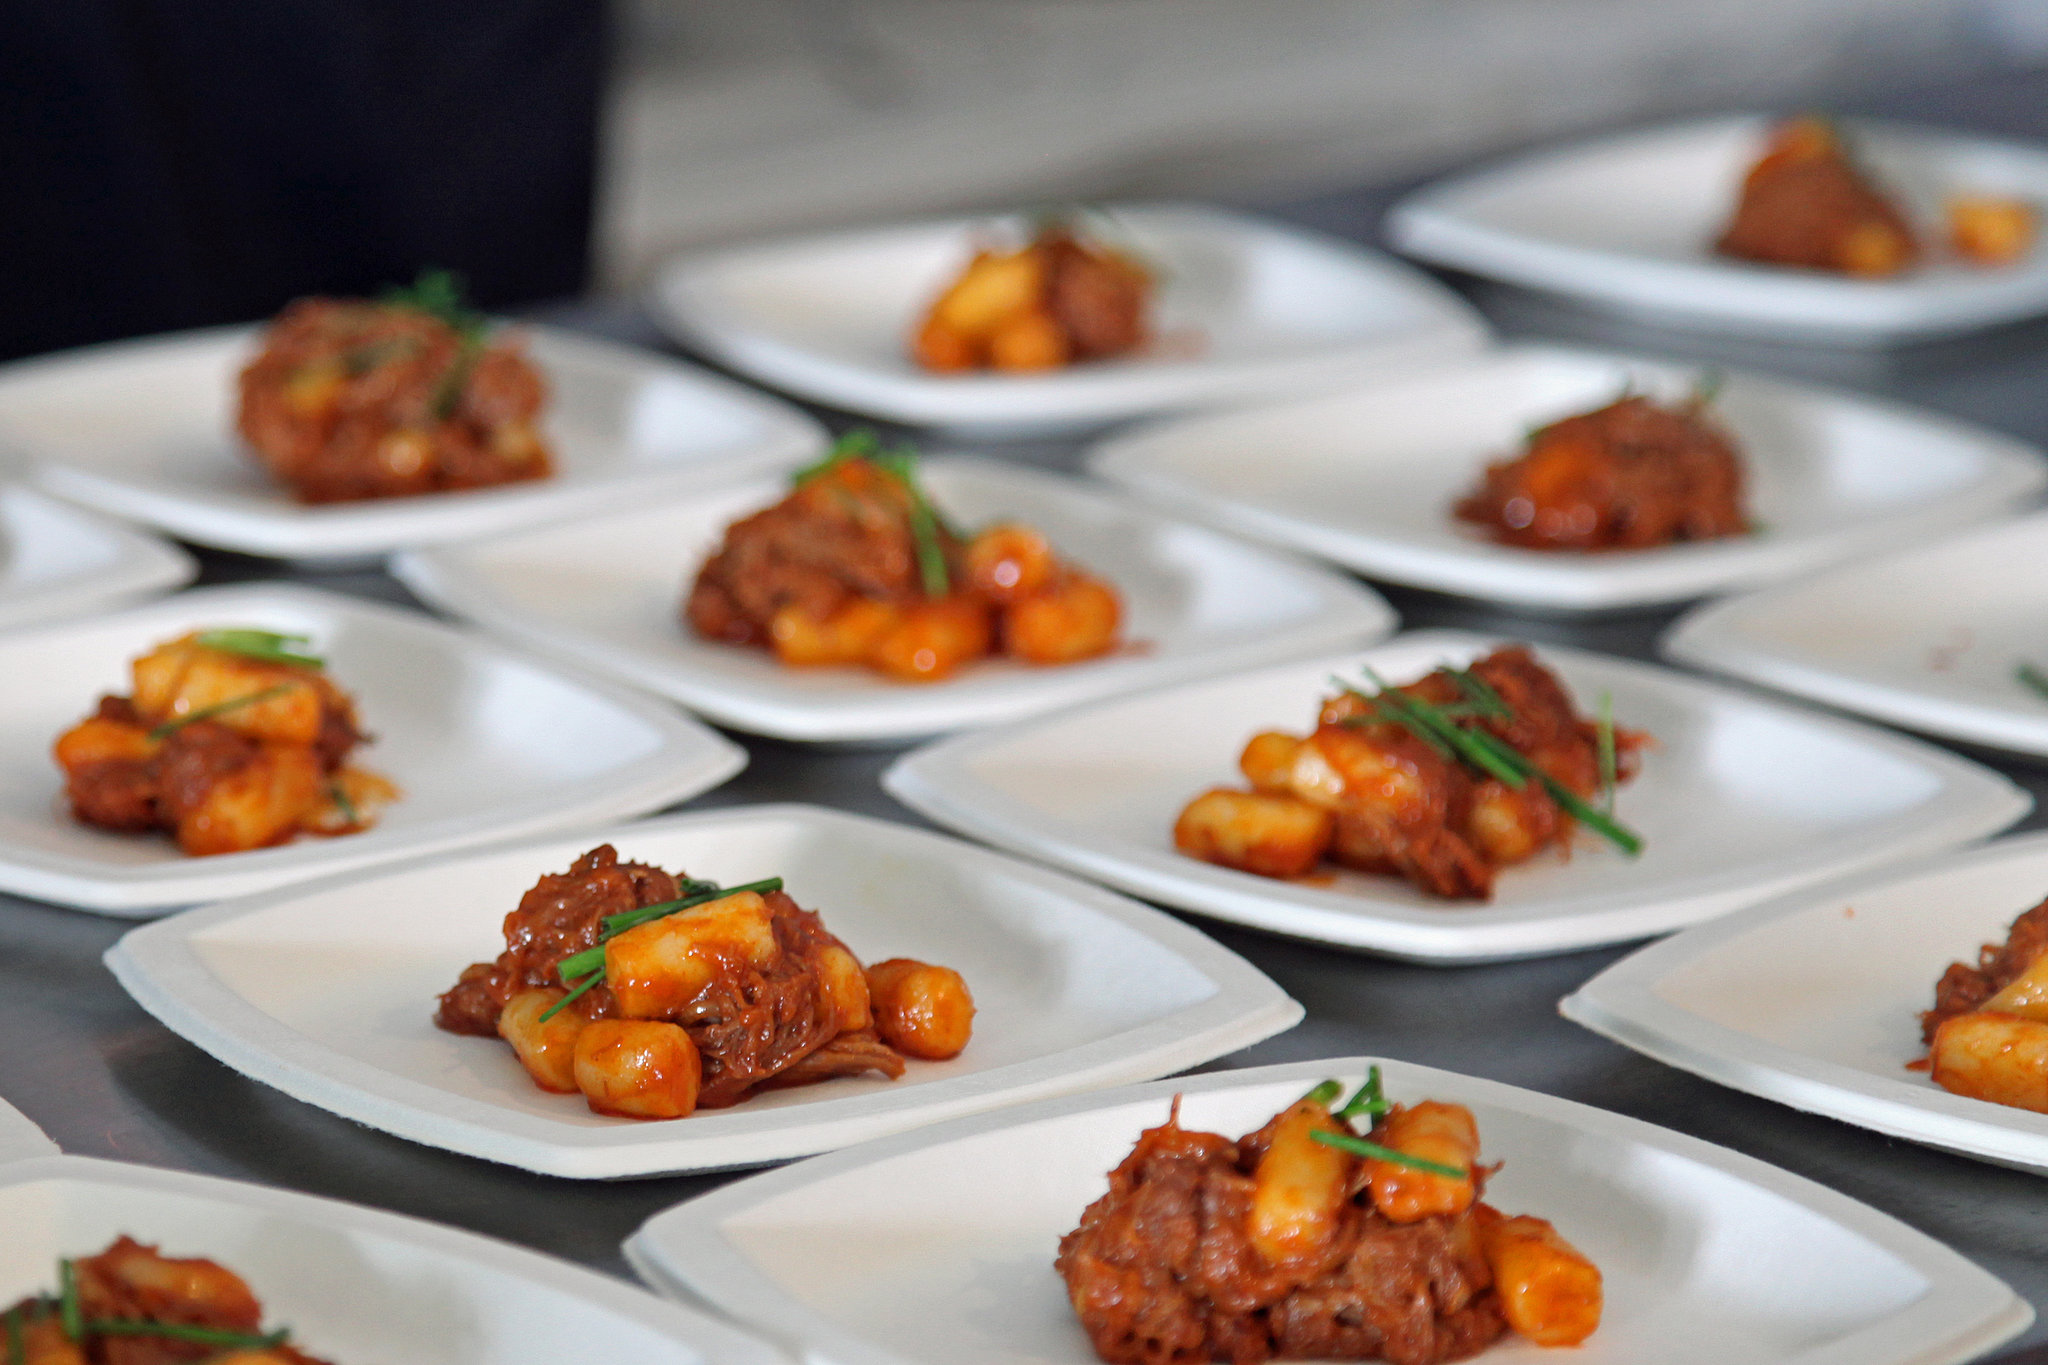 Korean Braised Goat and Dumplings